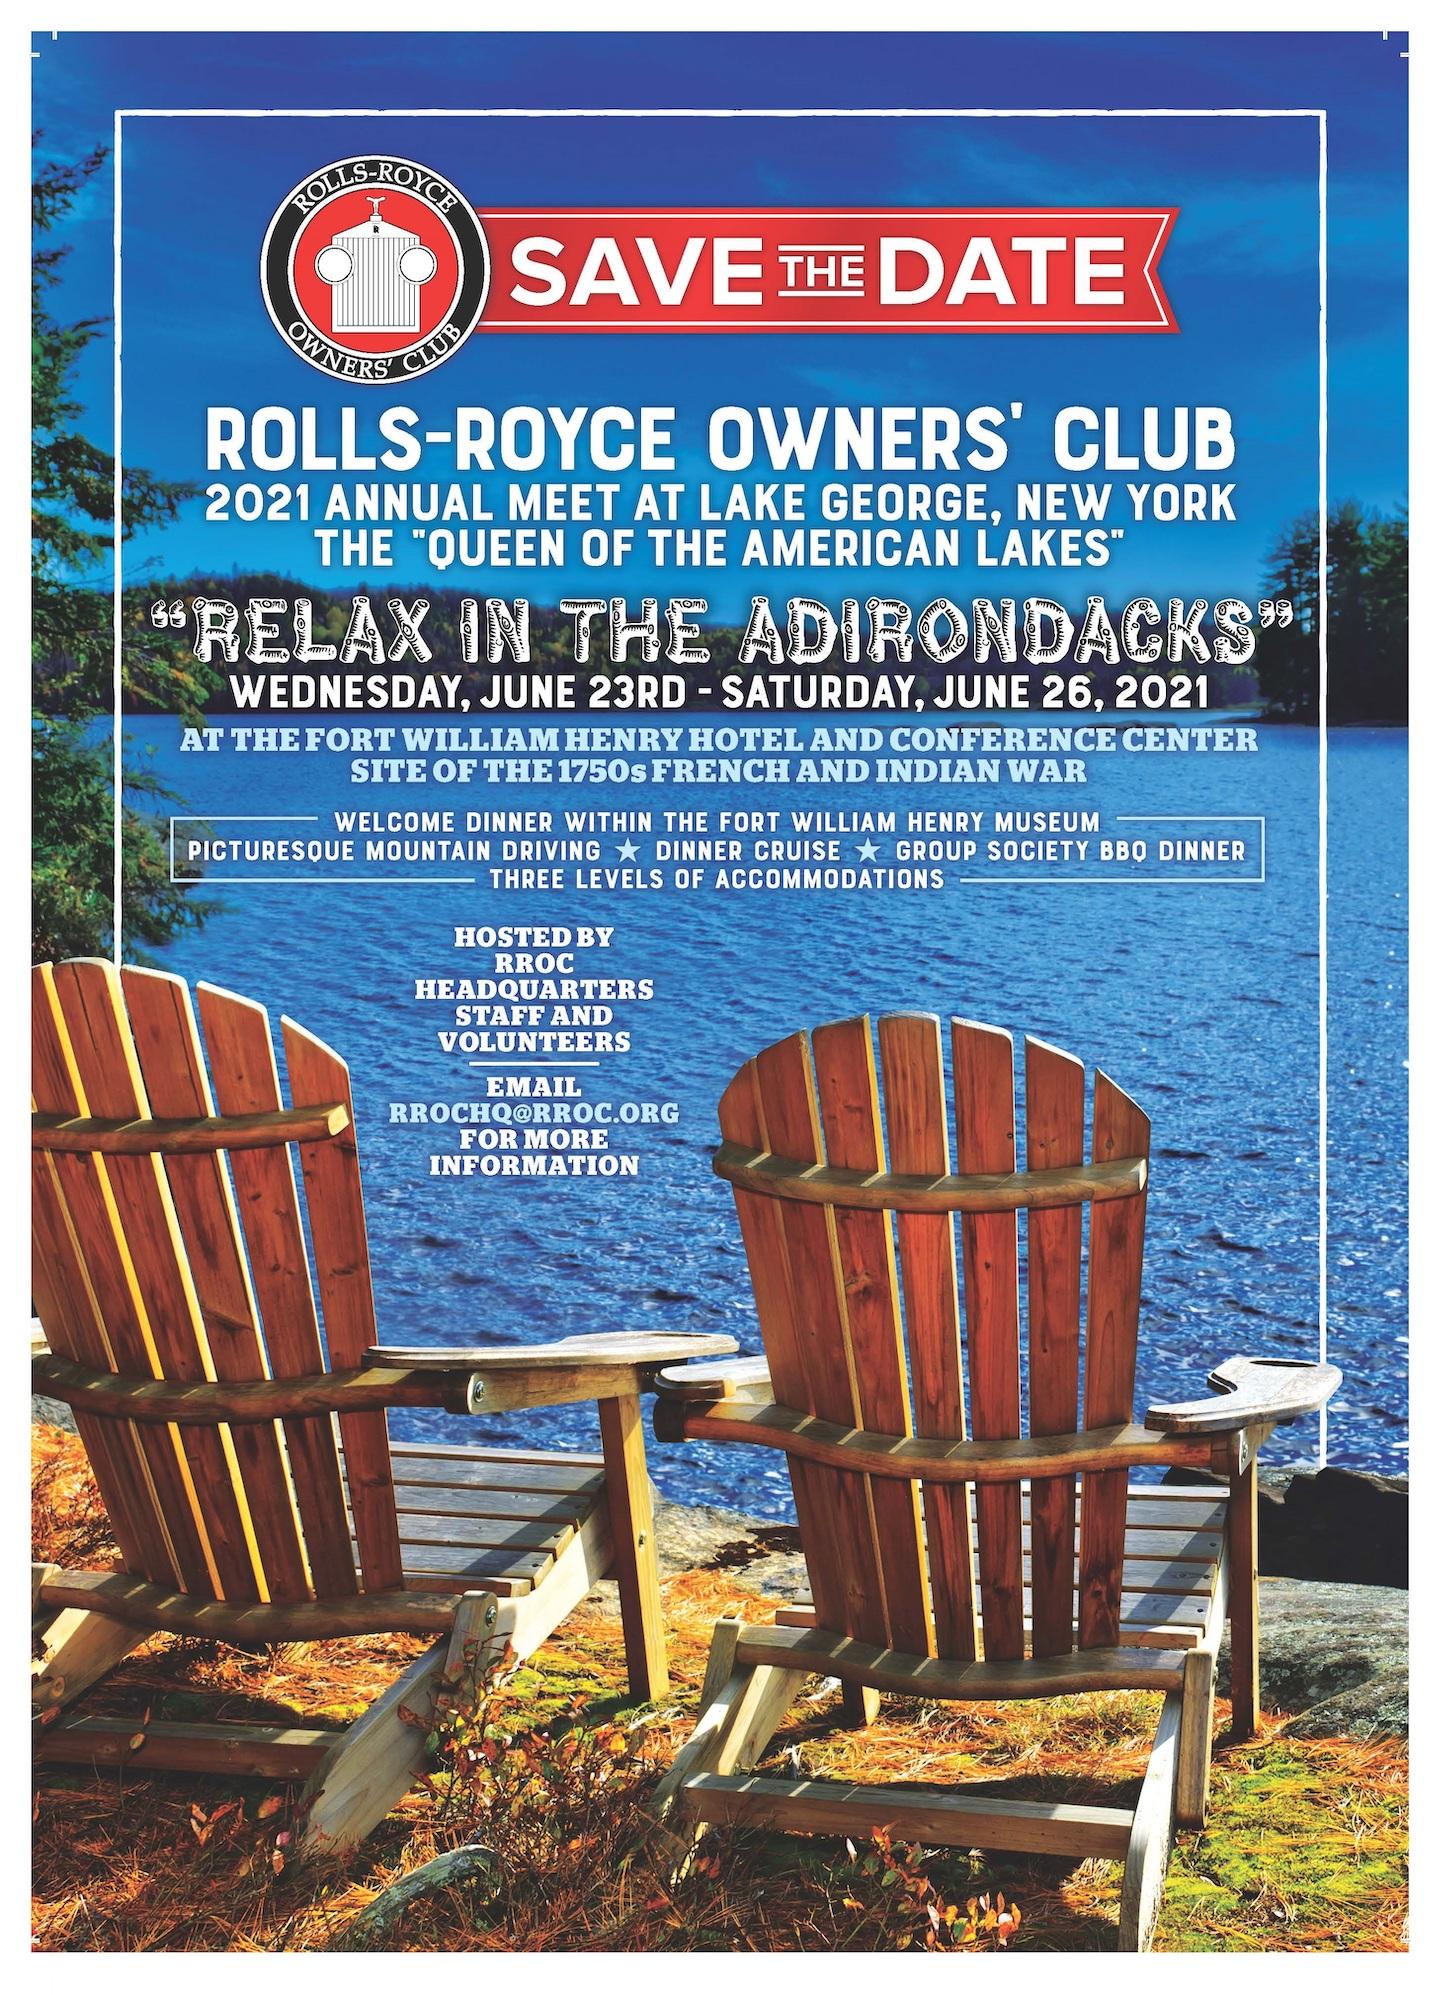 Rolls-Royce Owners' Club Annual Meet 2021 - New York